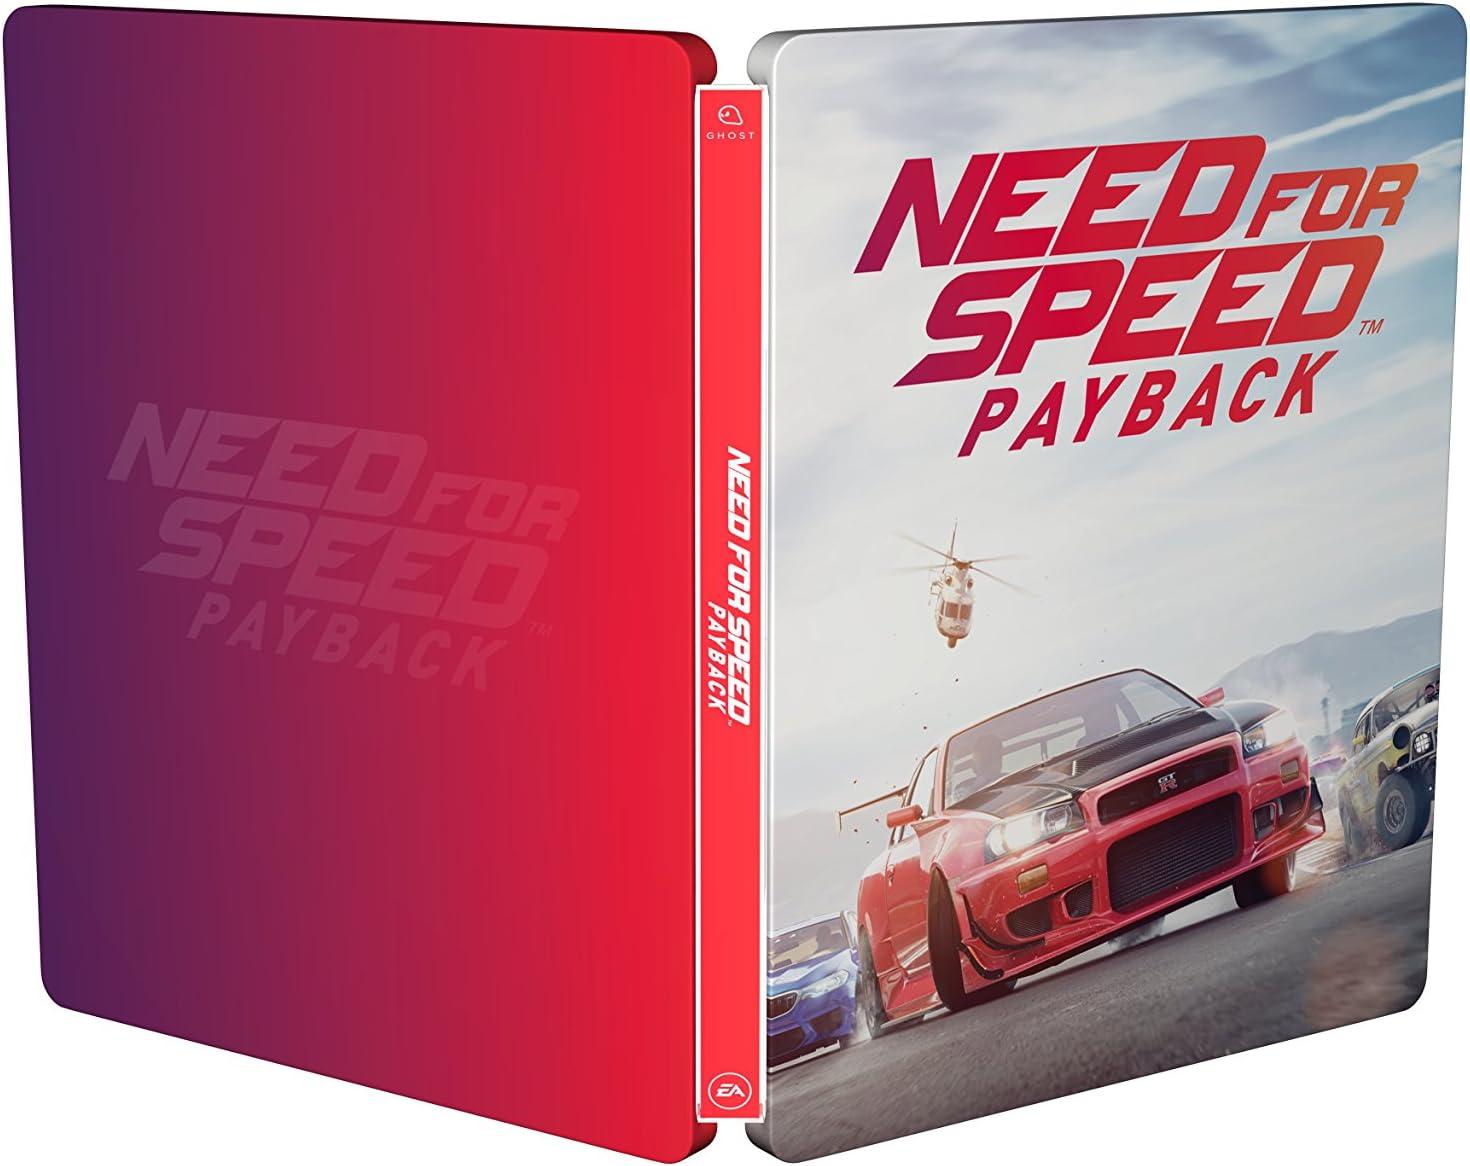 Need for Speed - Payback - Steelbook (exkl. bei Amazon.de) - [enthält kein Game] [Importación alemana]: Amazon.es: Videojuegos